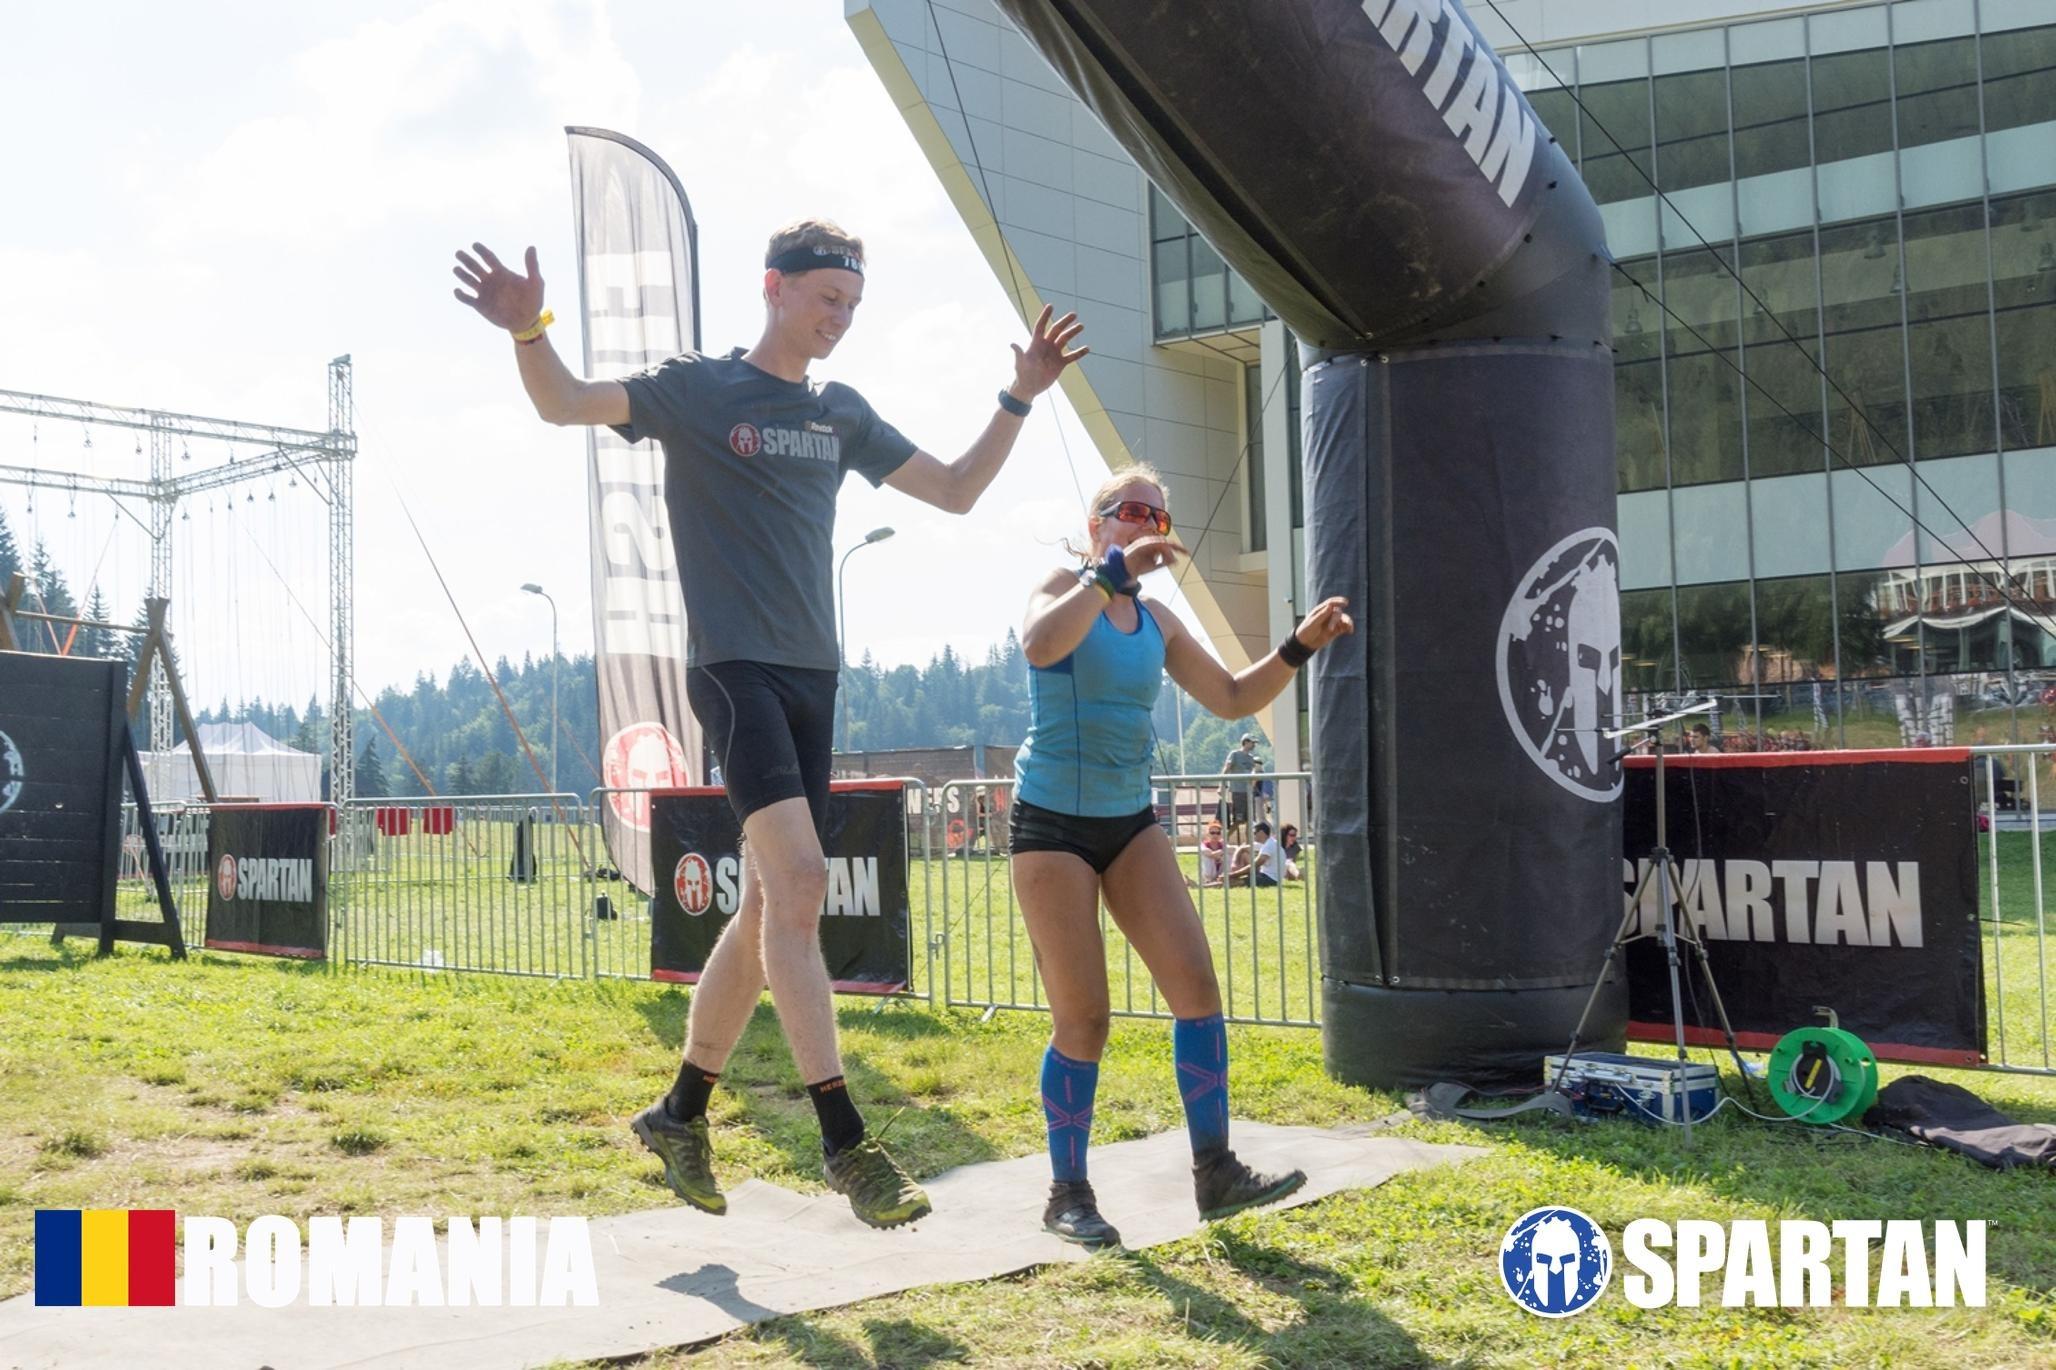 Sabina in Mudland - Spartan Race Romania Finishing together